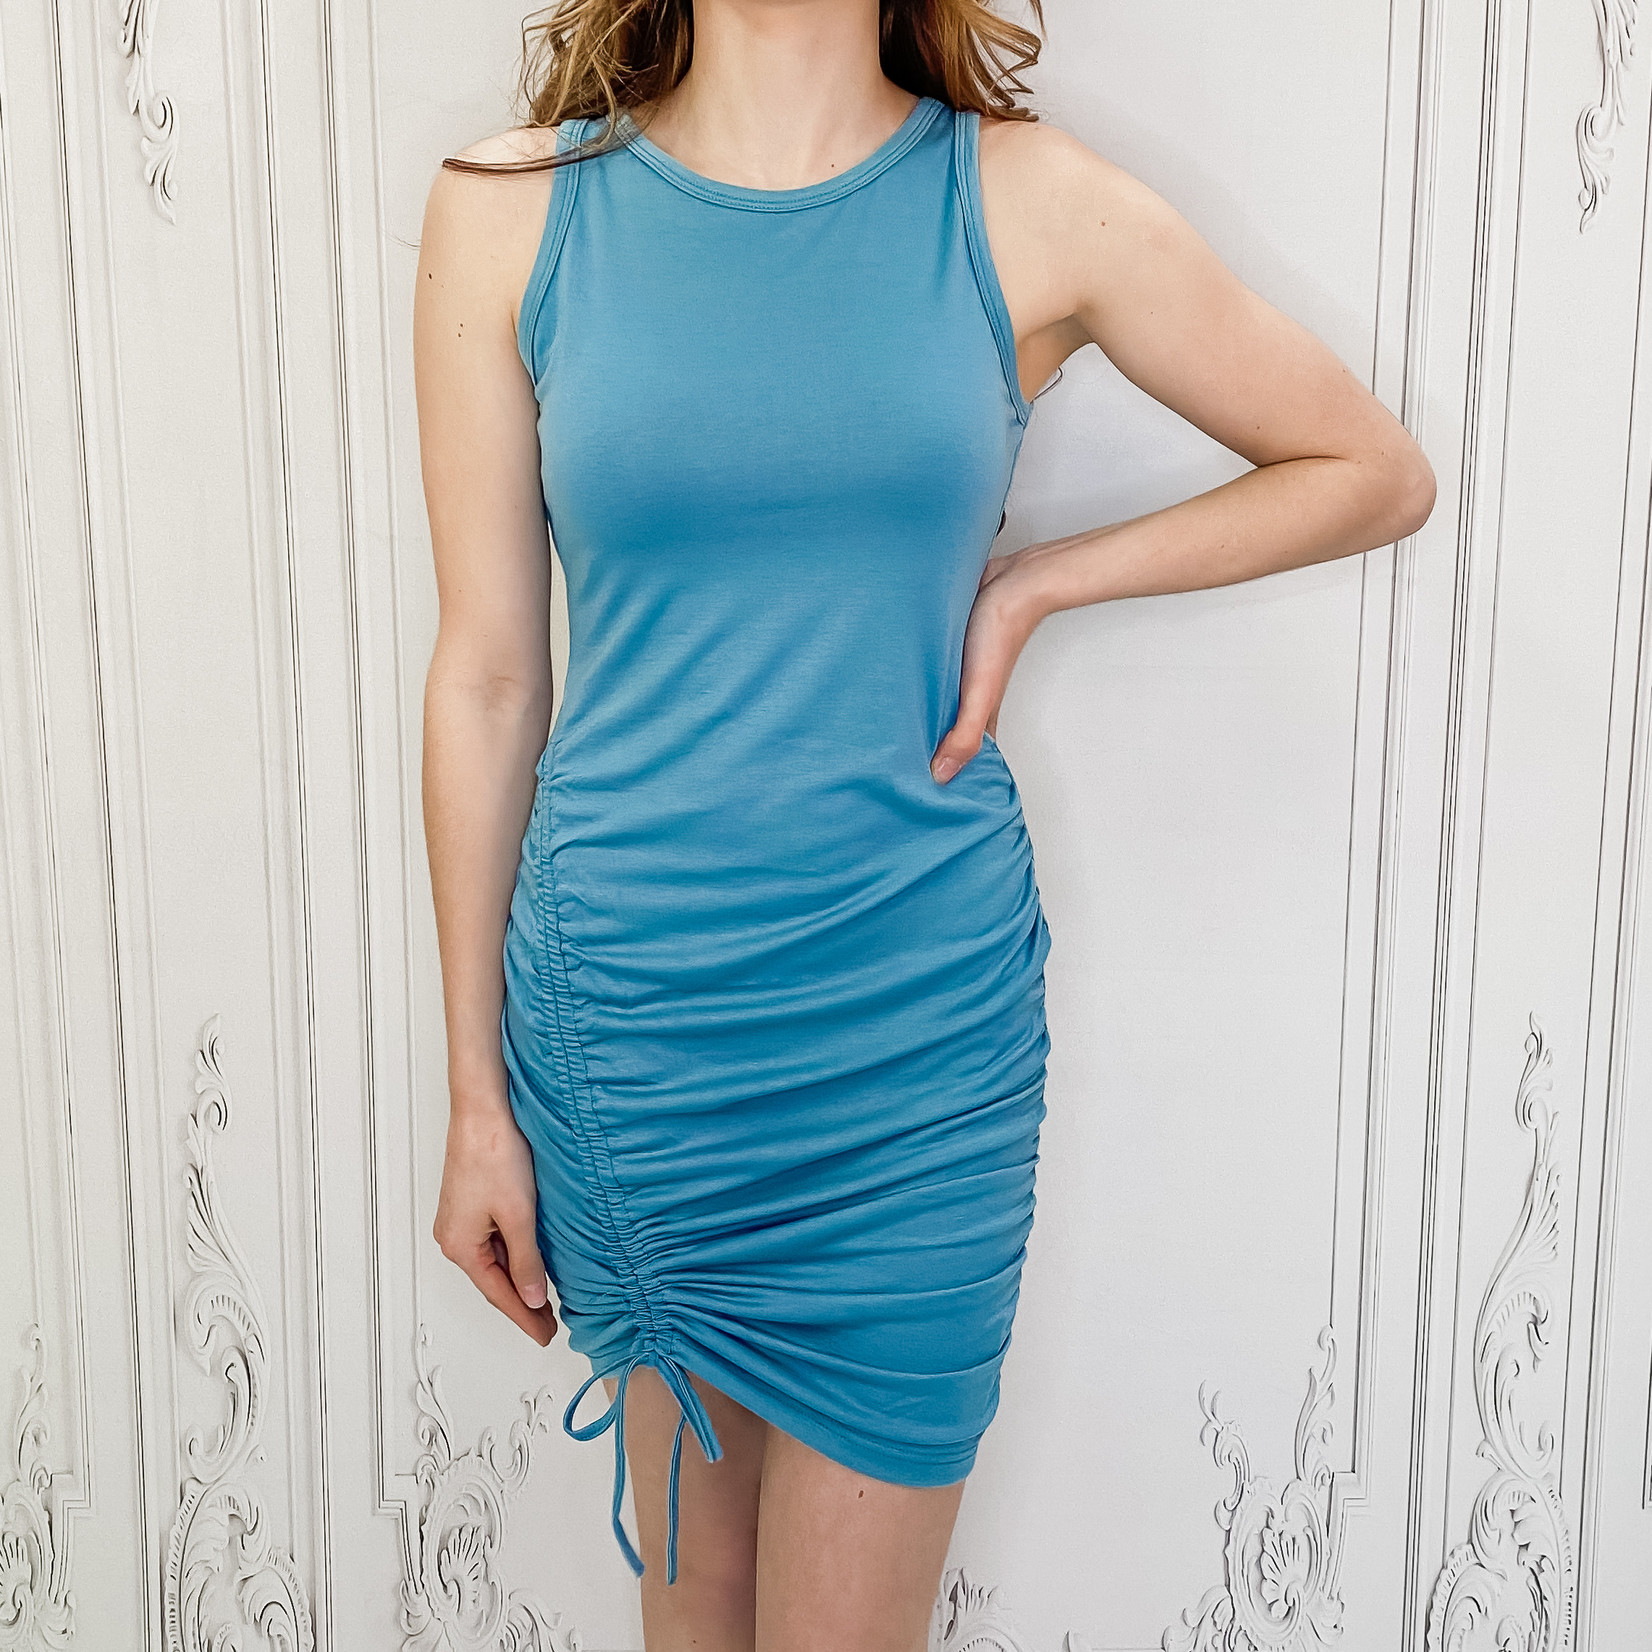 Skyla ruched side tank dress